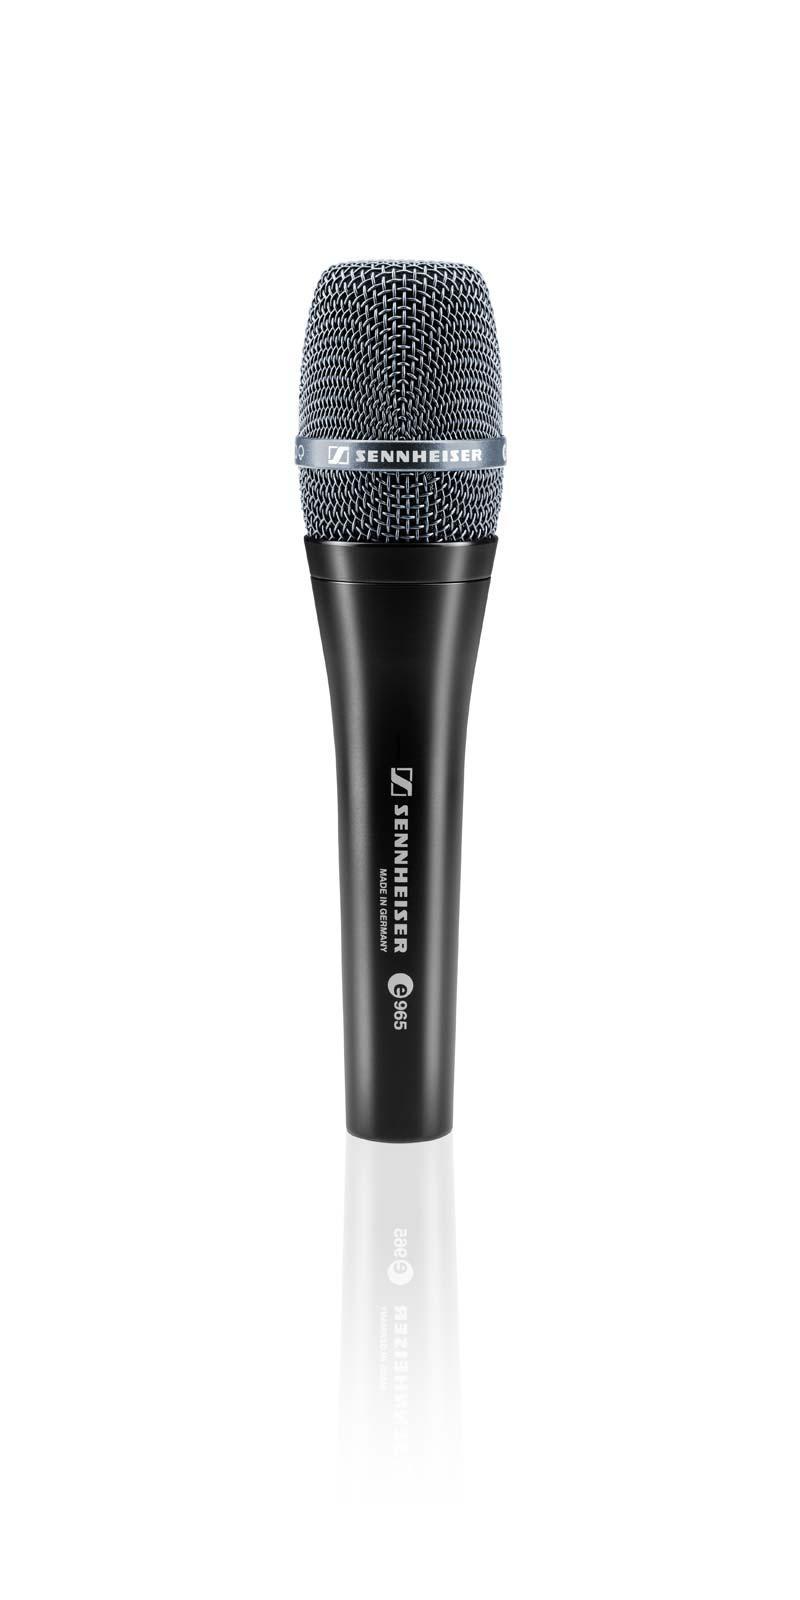 sennheiser e965 evolution dual diaphragm vocal microphone agiprodj. Black Bedroom Furniture Sets. Home Design Ideas